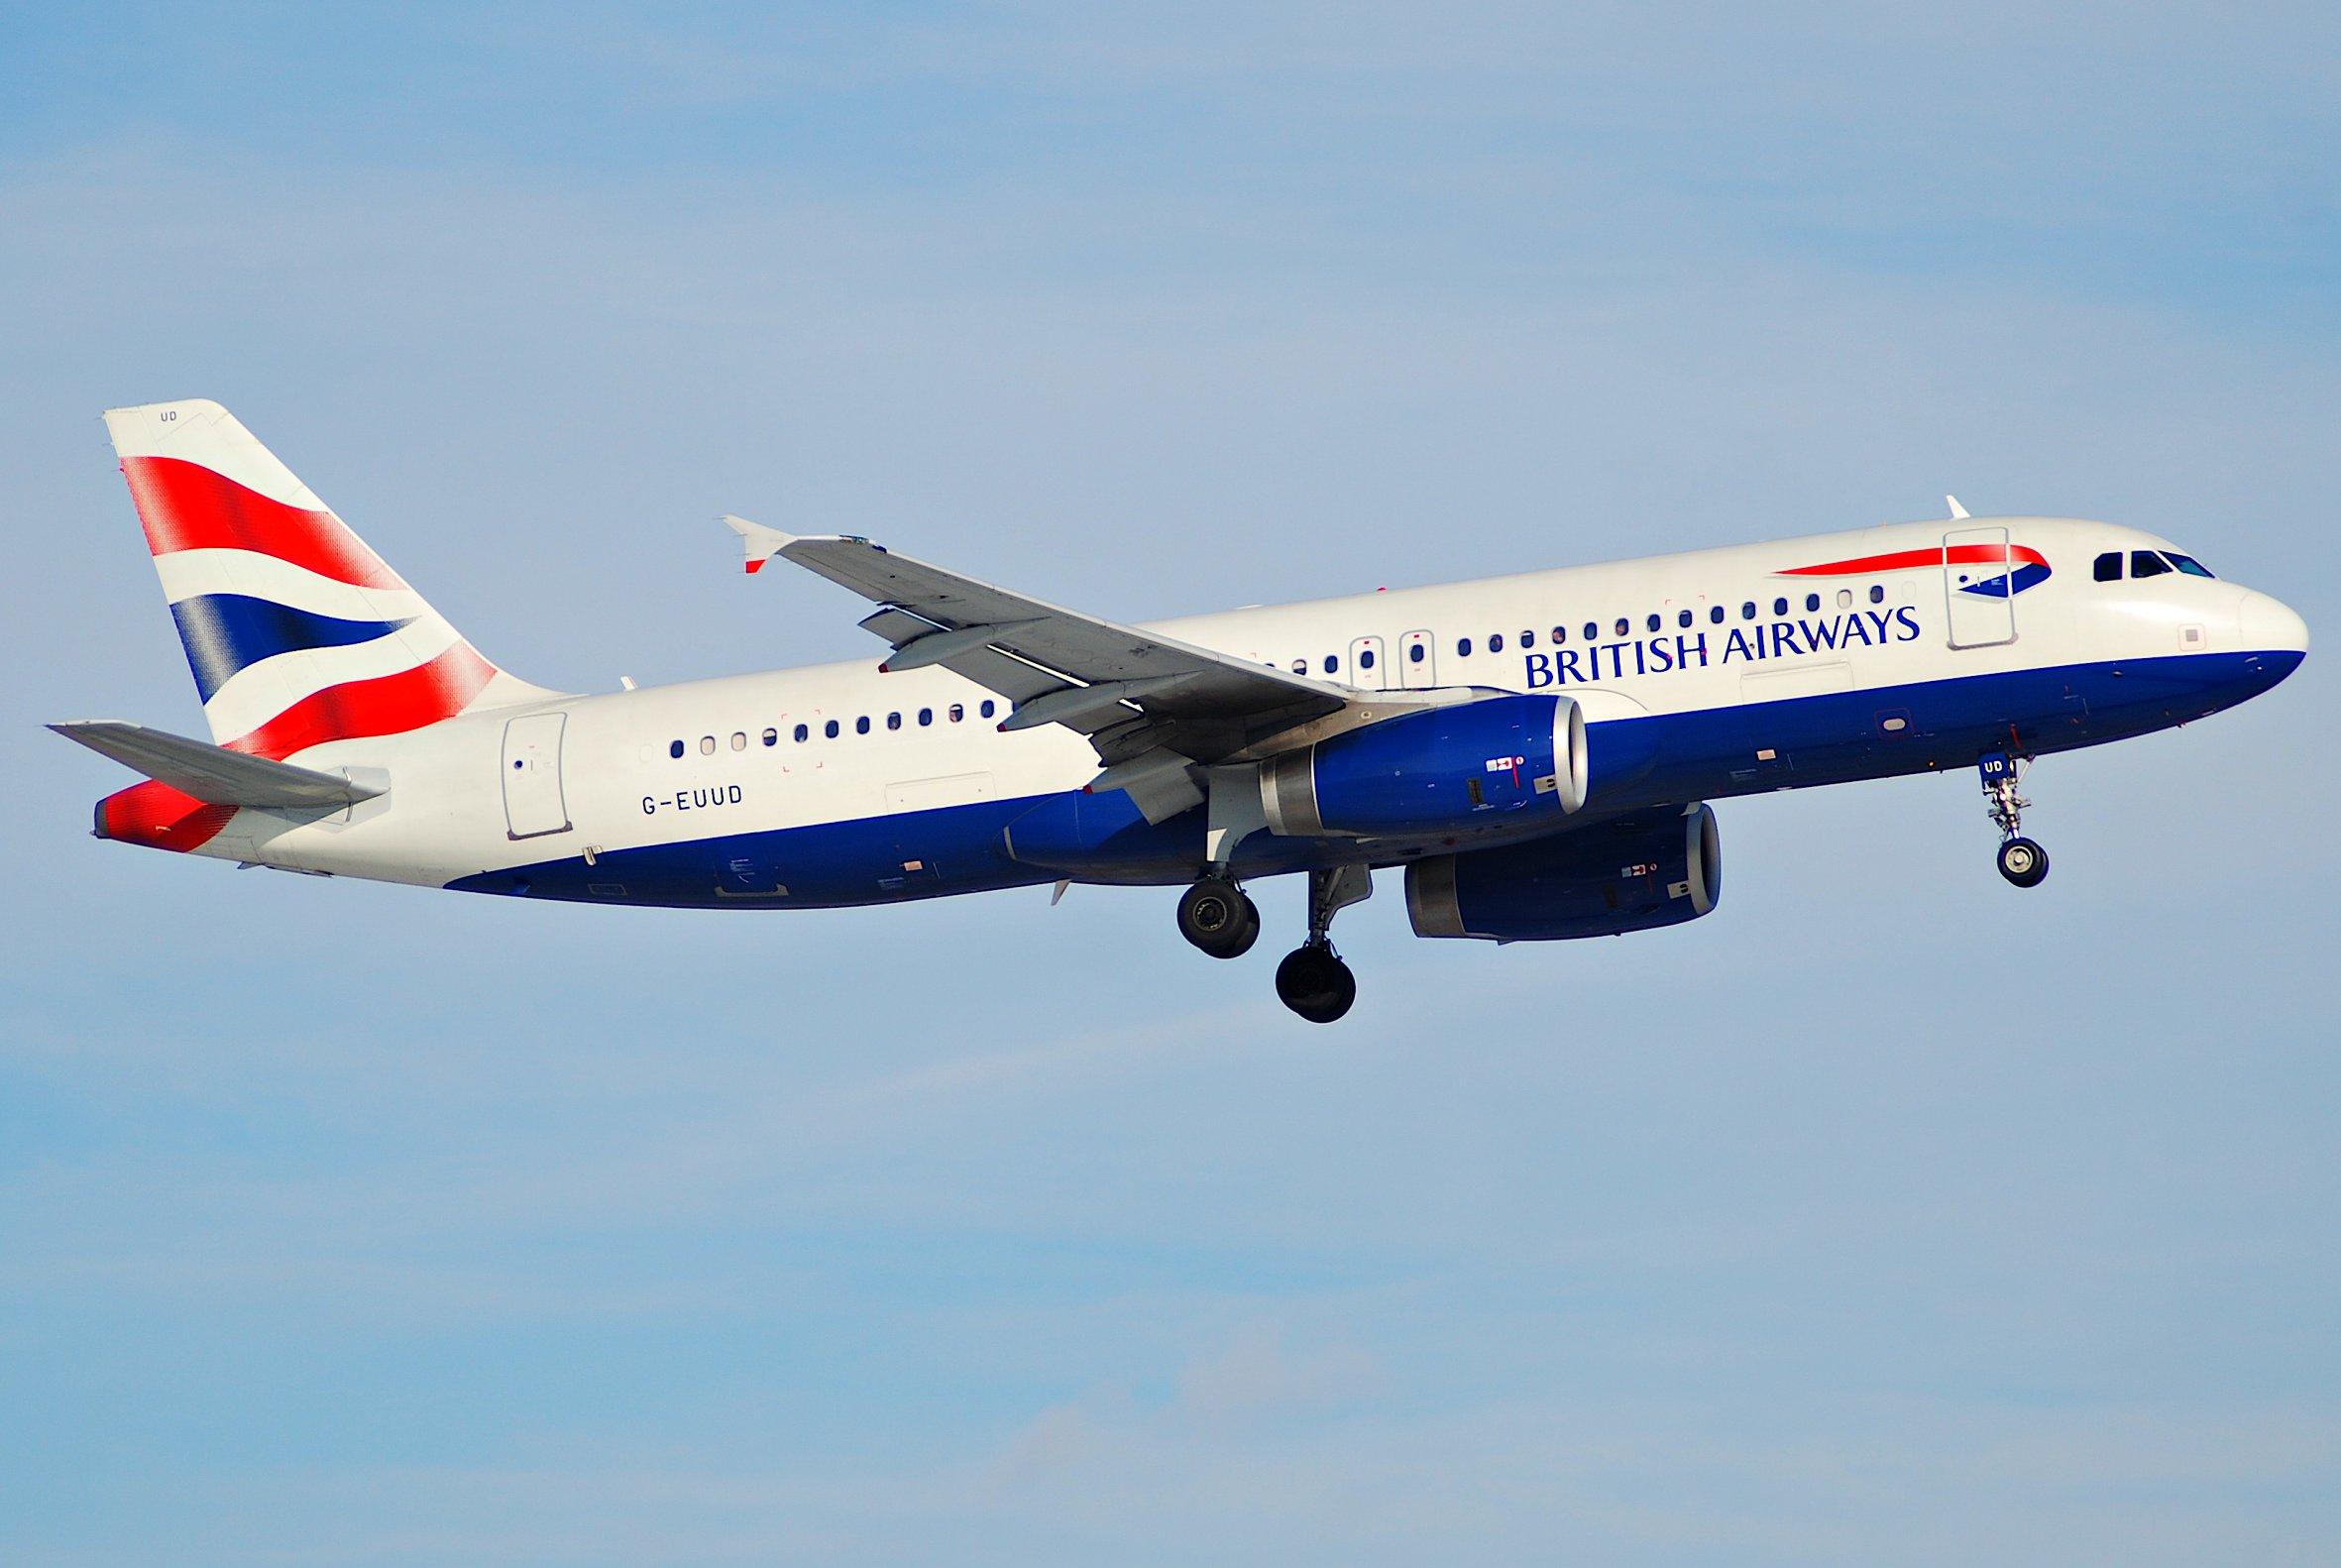 Un drone a percuté un avion de ligne en Angleterre